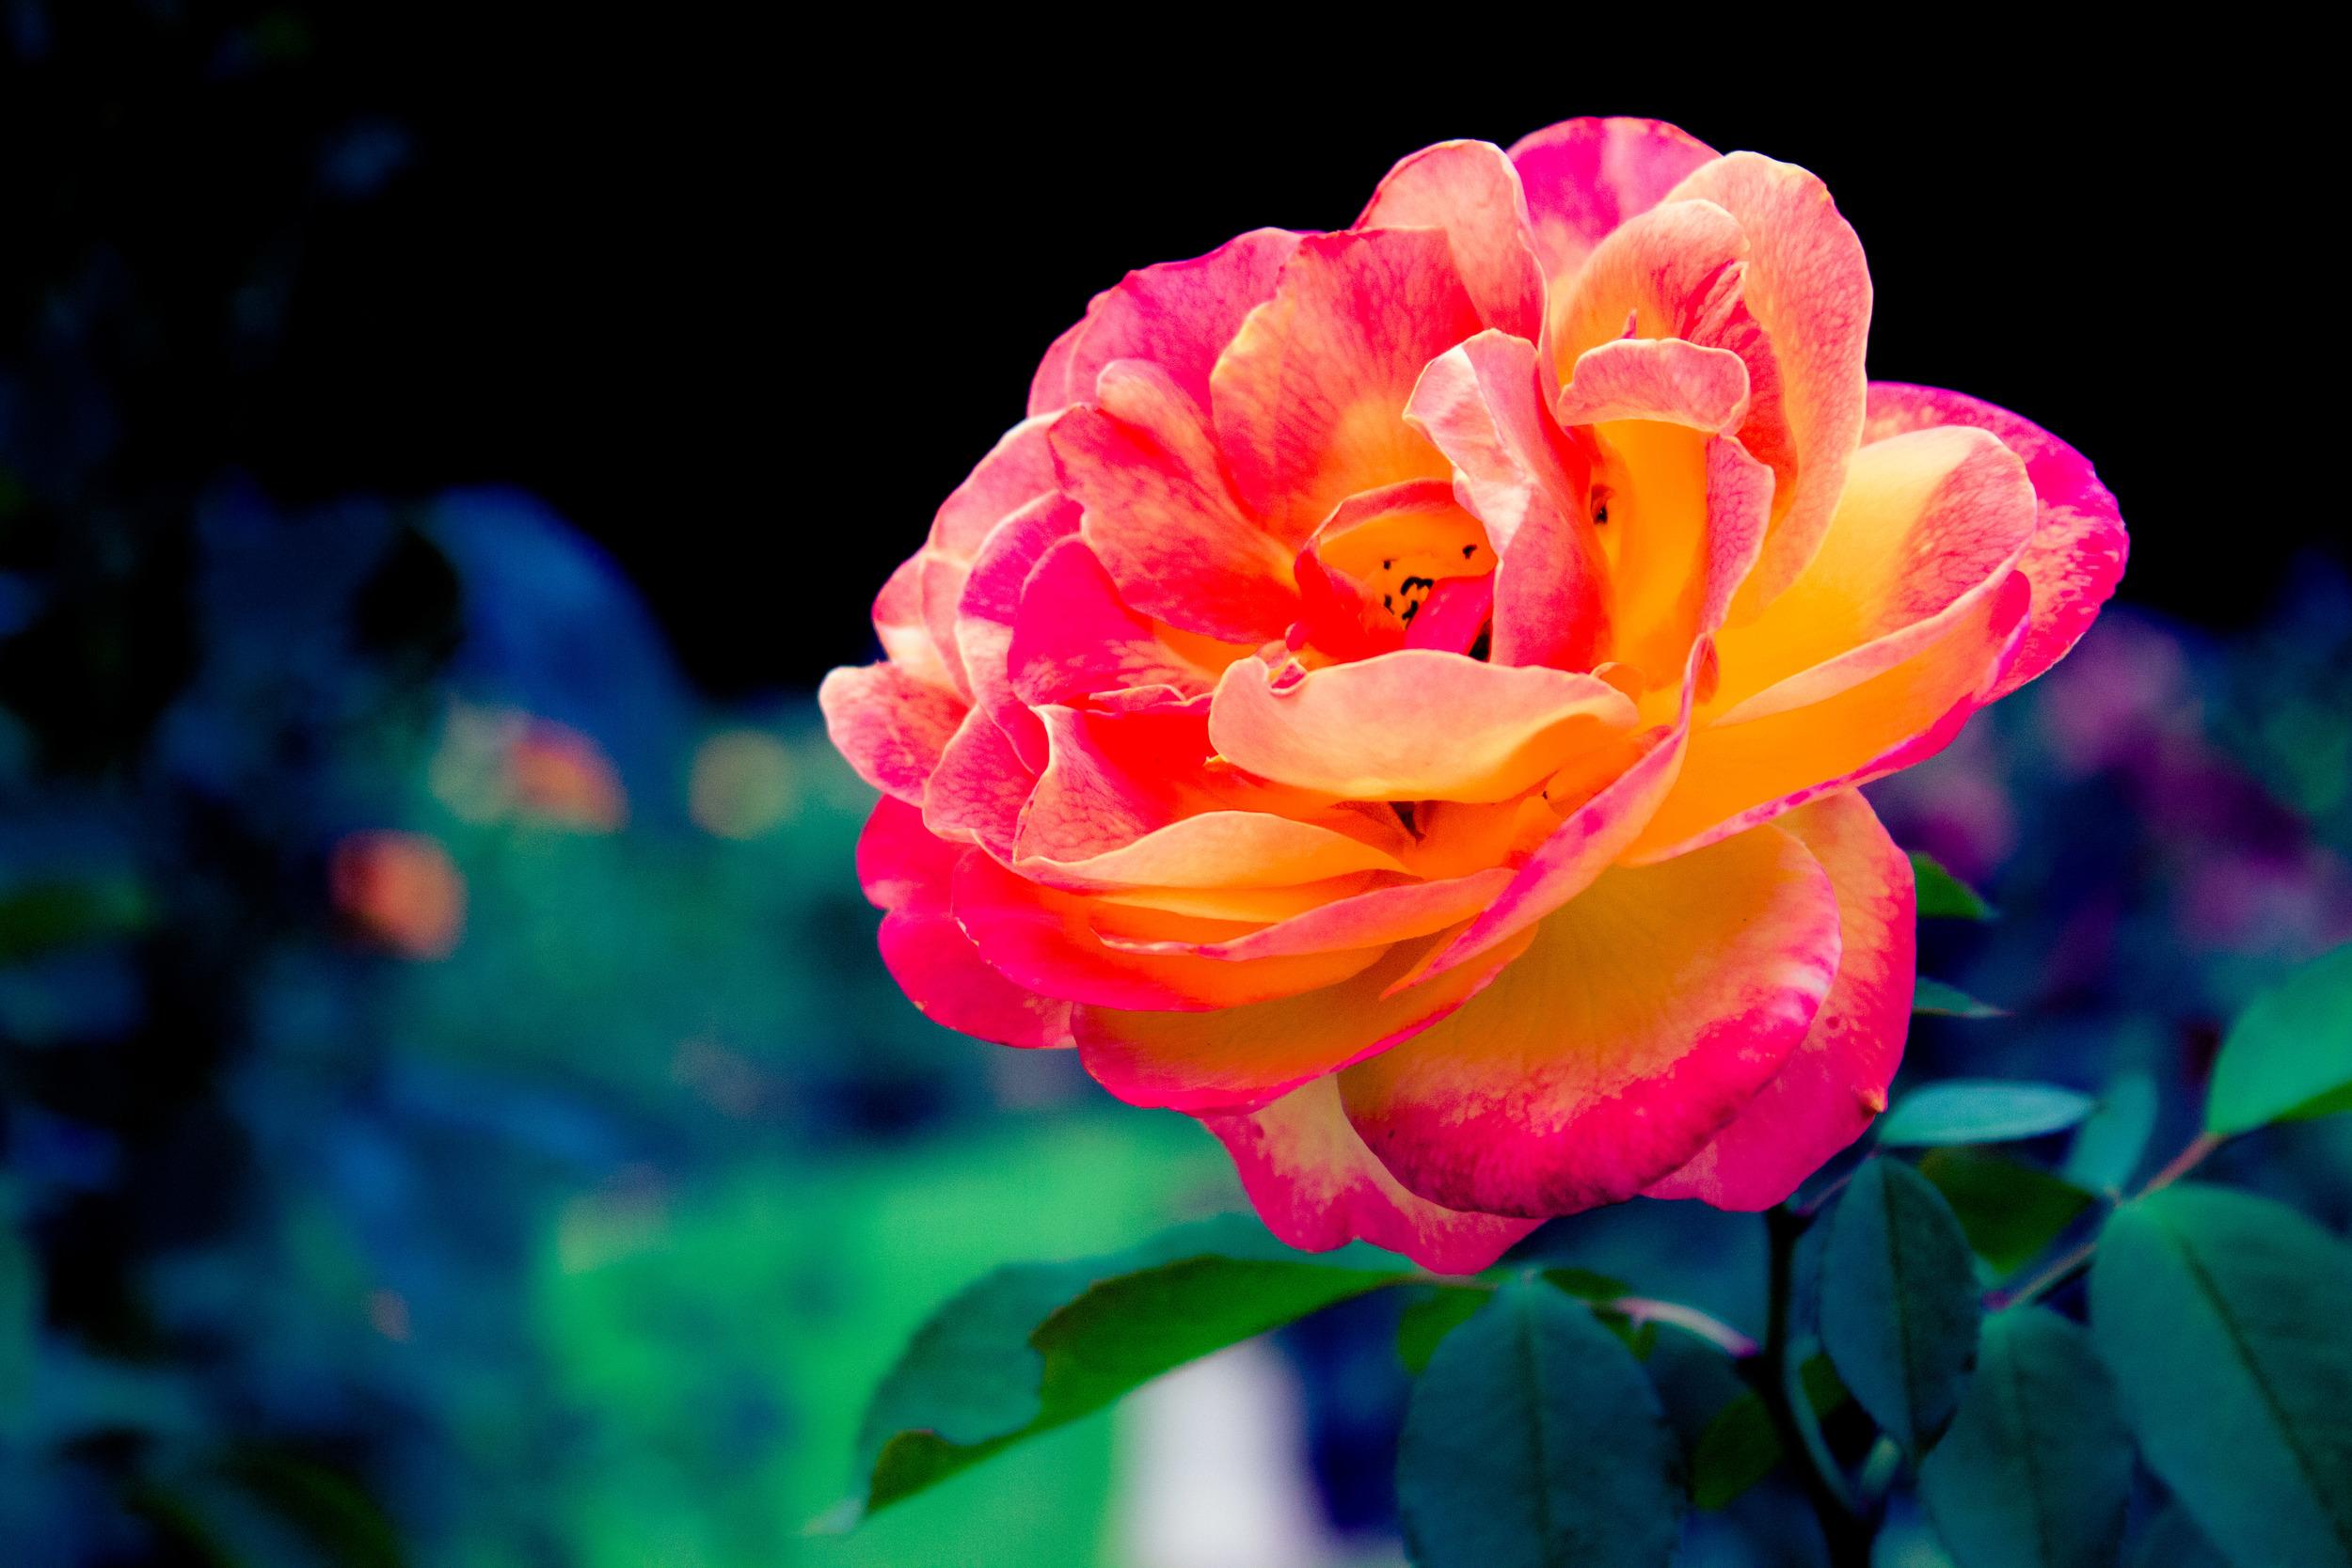 flower.bham.jpg